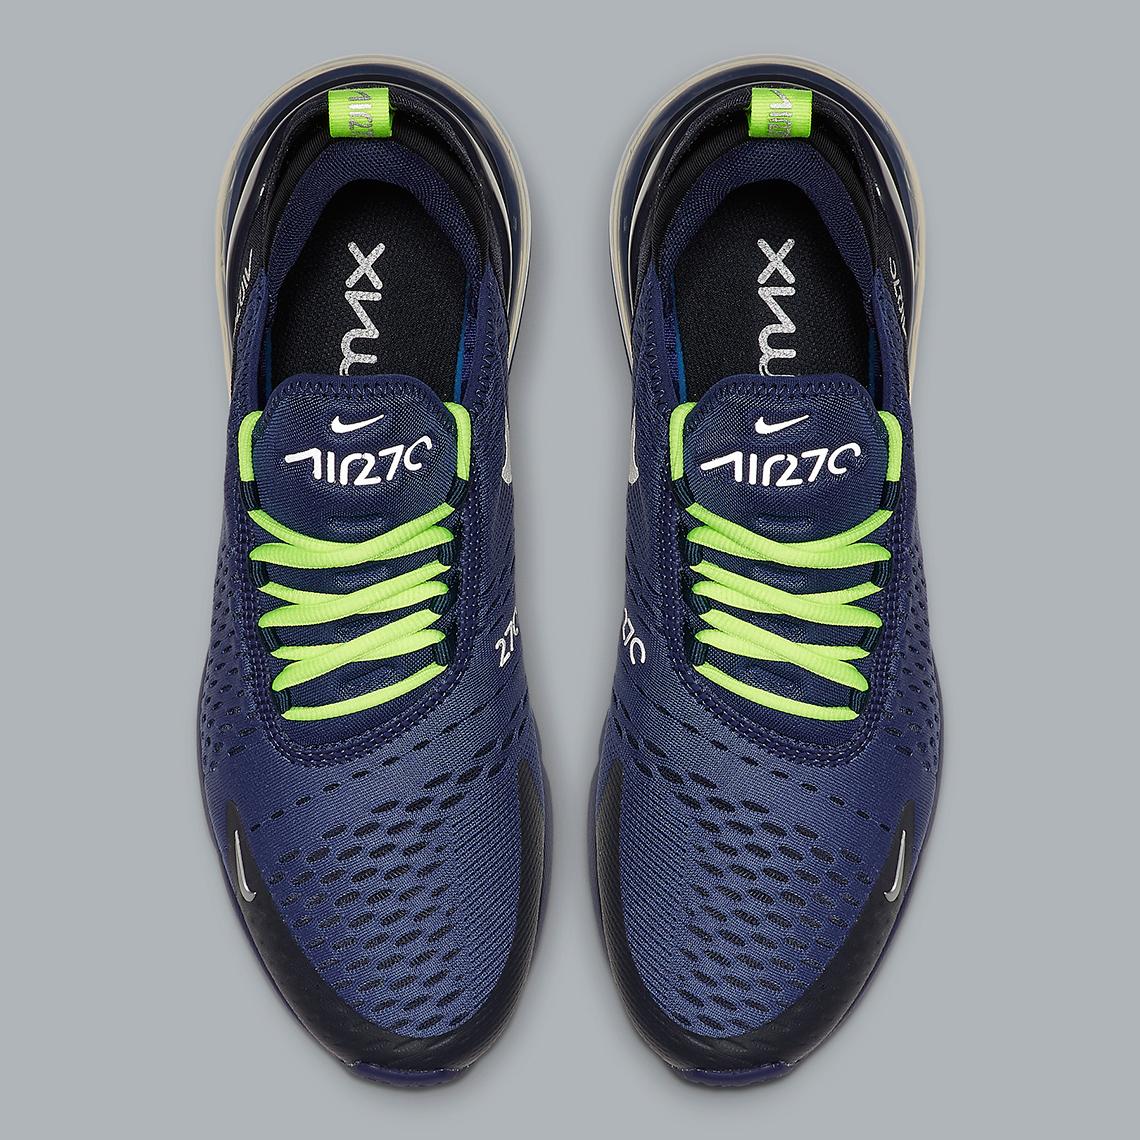 Nike Air Max 270 Seahawks CD7337-400 Info | SneakerNews.com